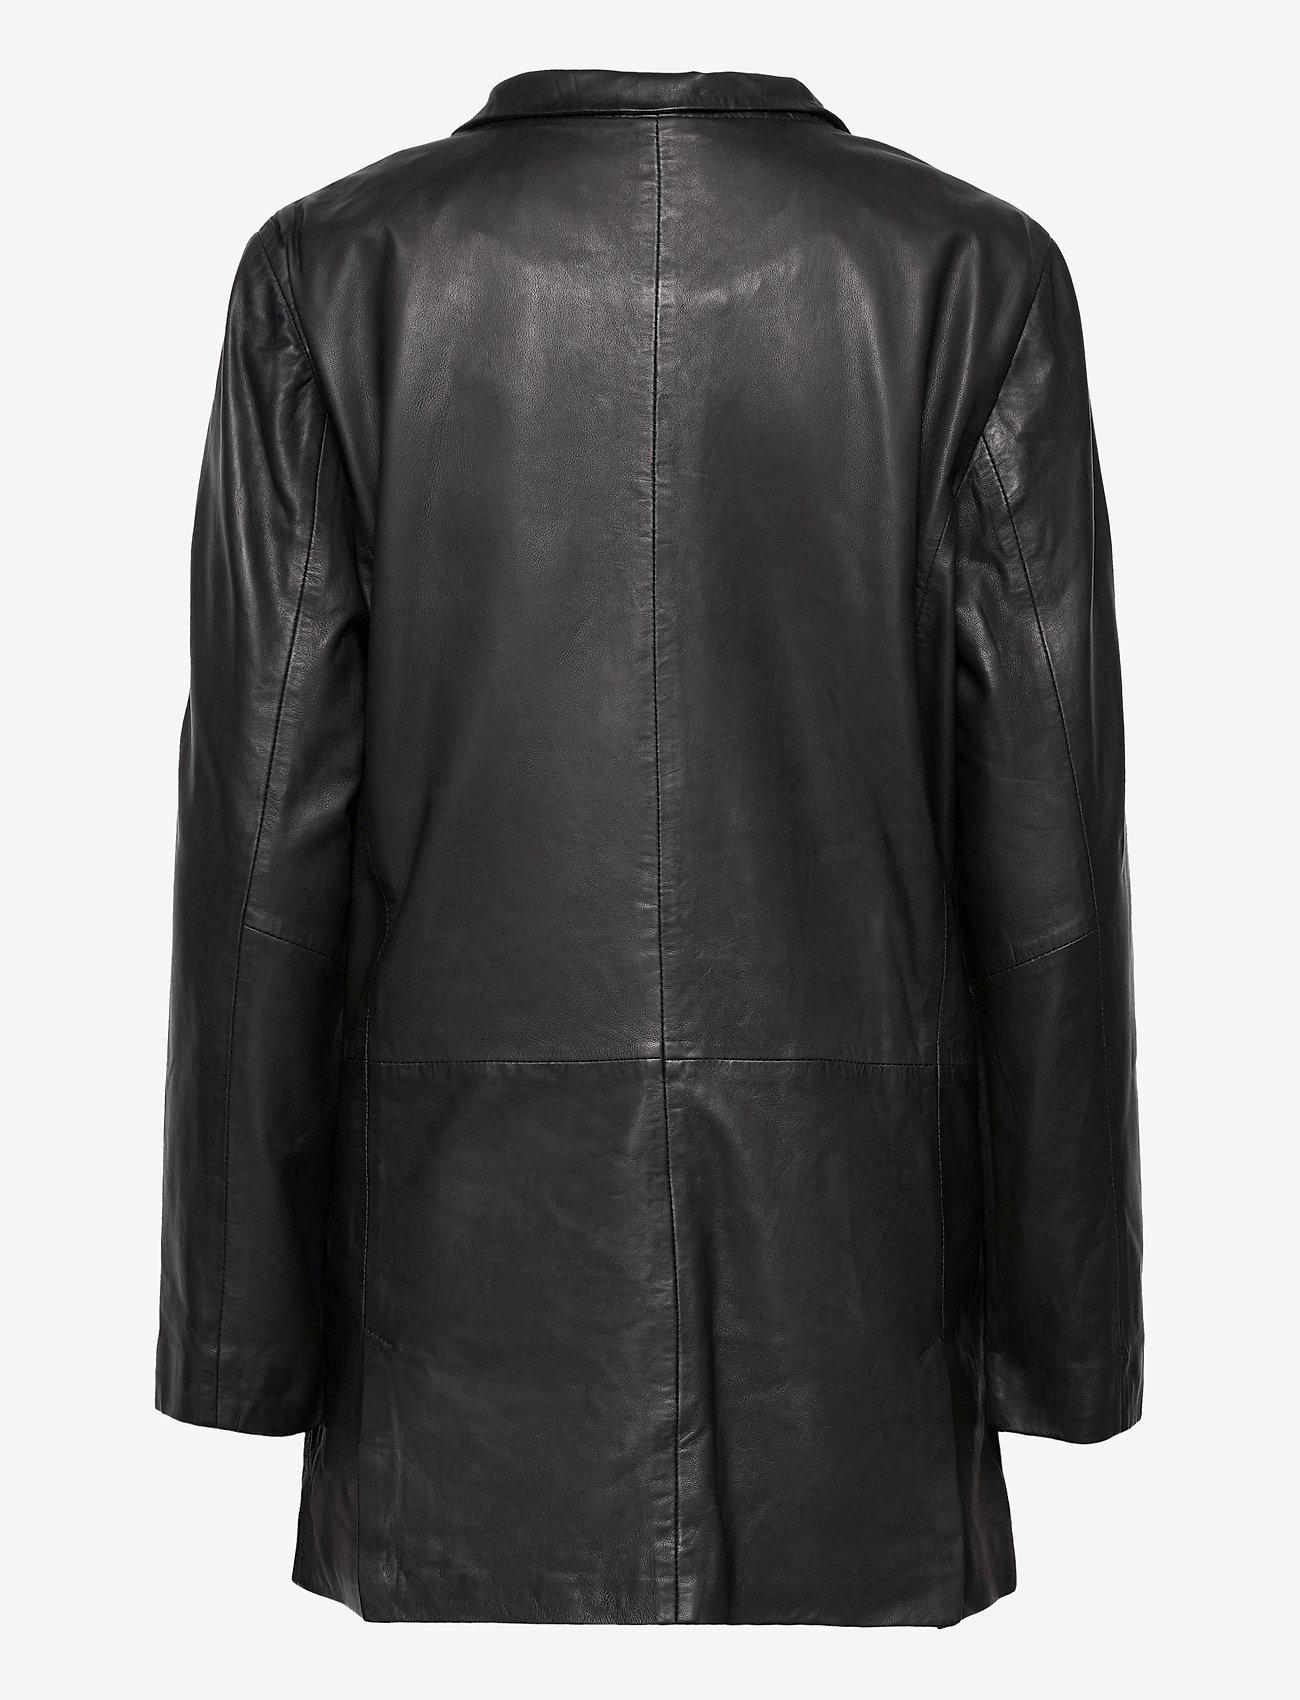 MDK / Munderingskompagniet - Coco thin leather blazer - vardagskavajer - black - 1